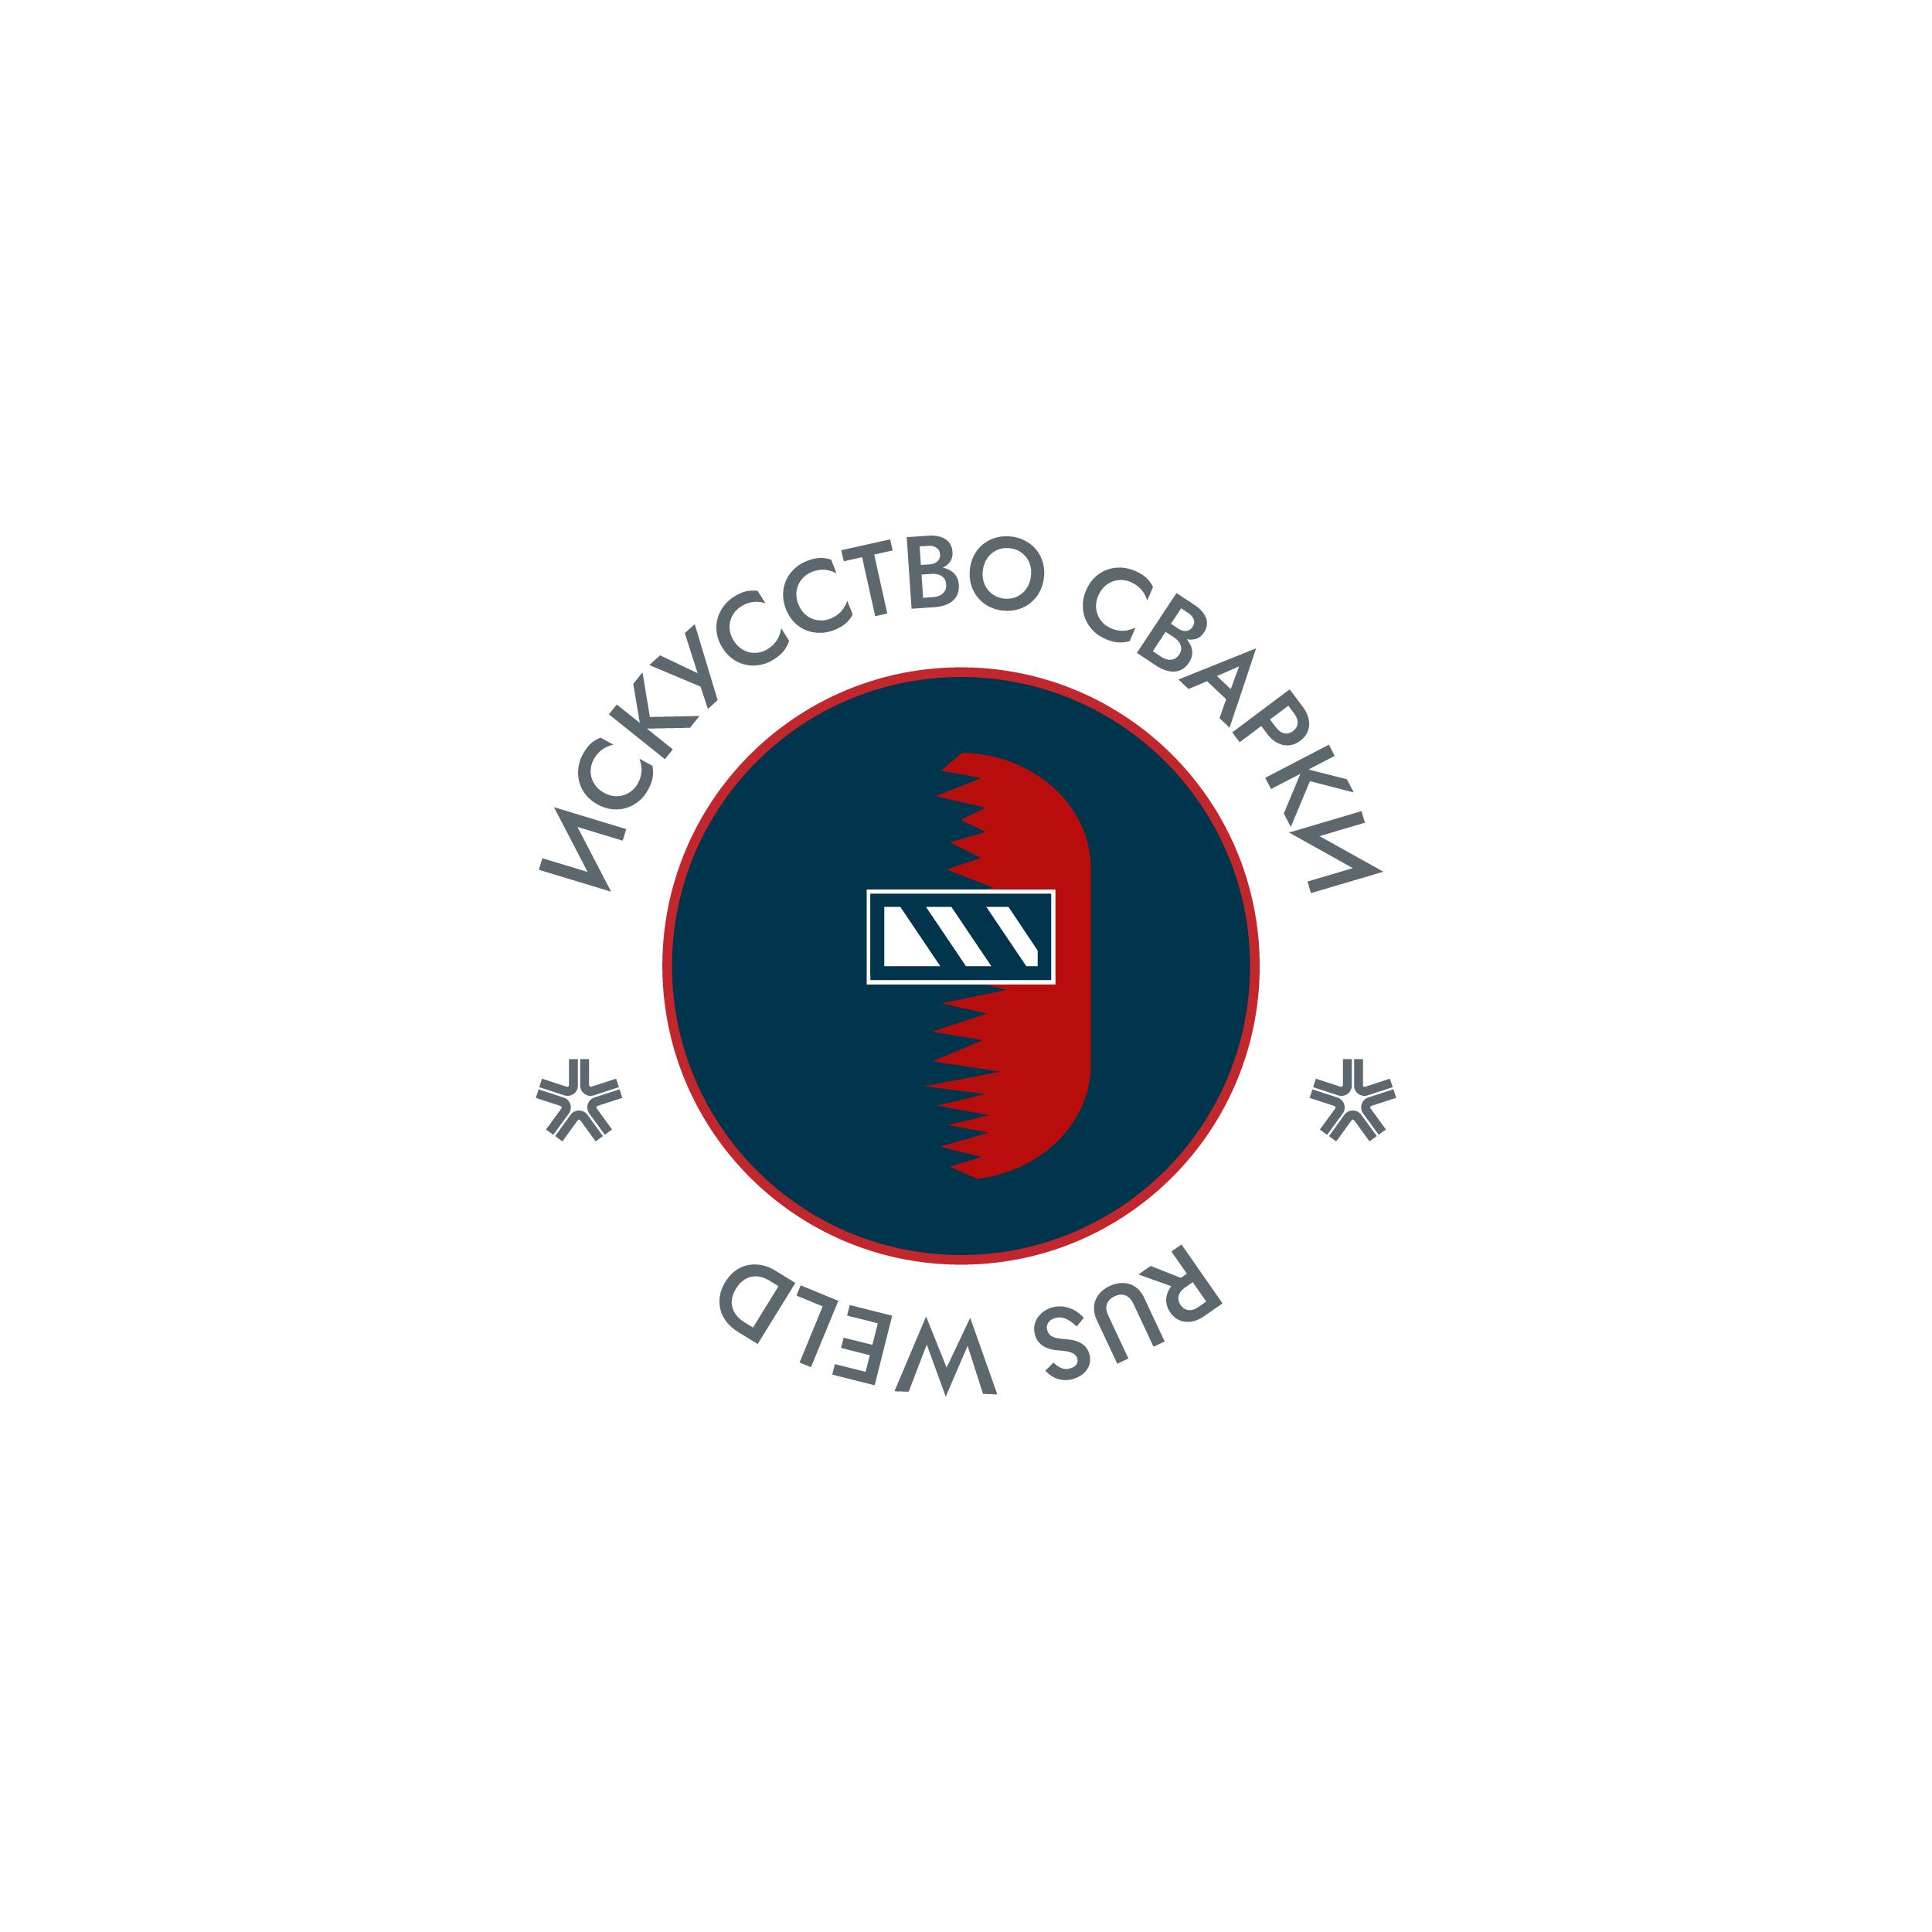 Разработка логотипа для Конкурса фото f_1235f6d5bc68c64c.jpg